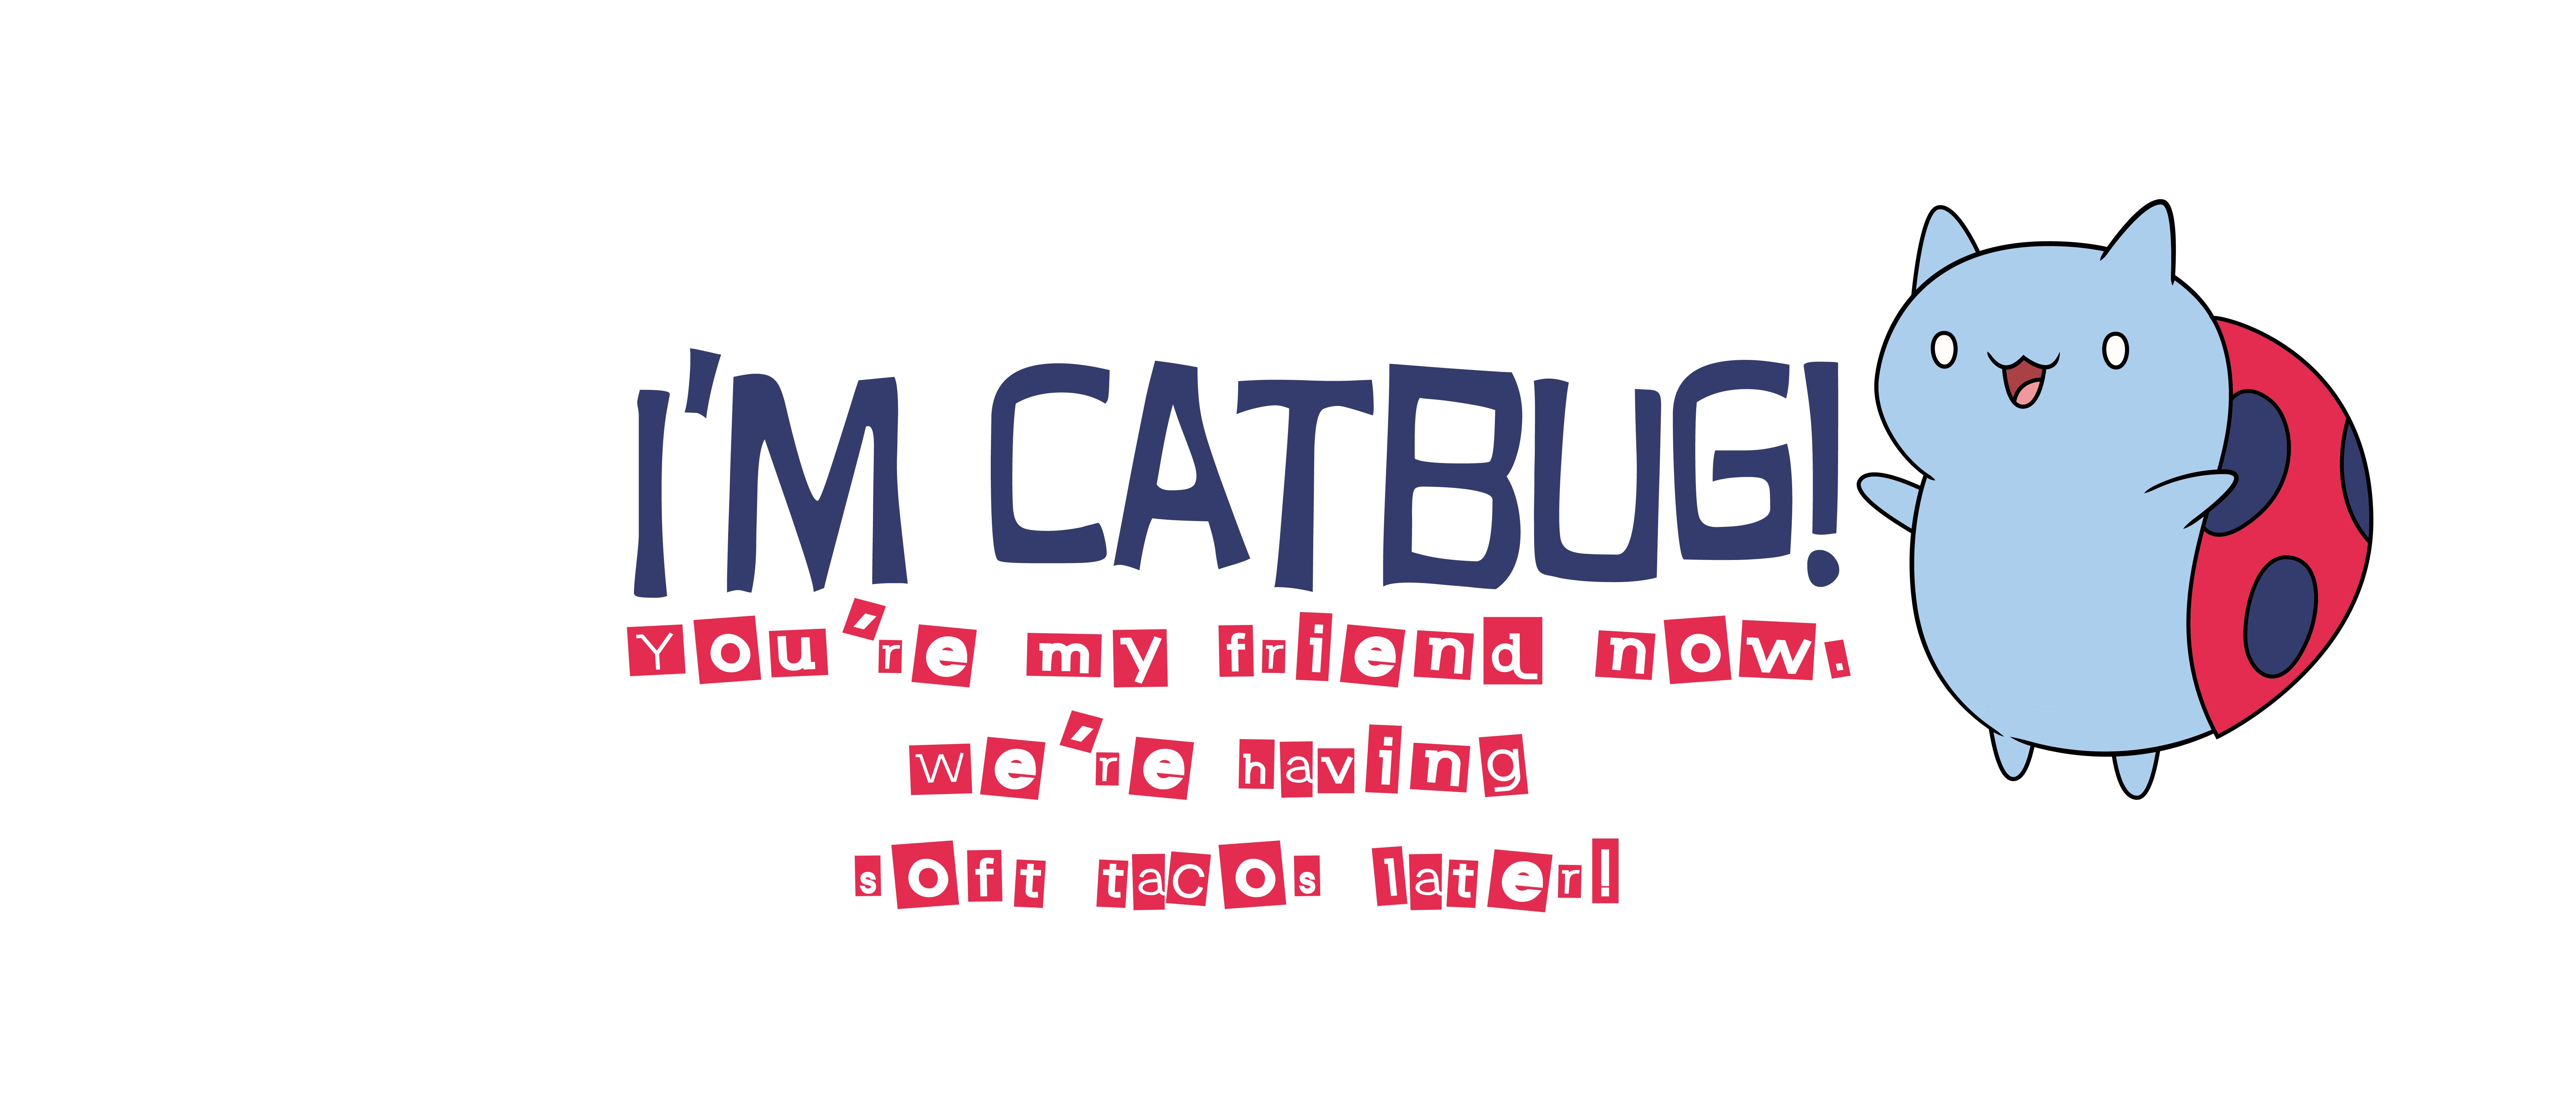 i_m_catbug__by_lexykupoakumalavone-d63qf